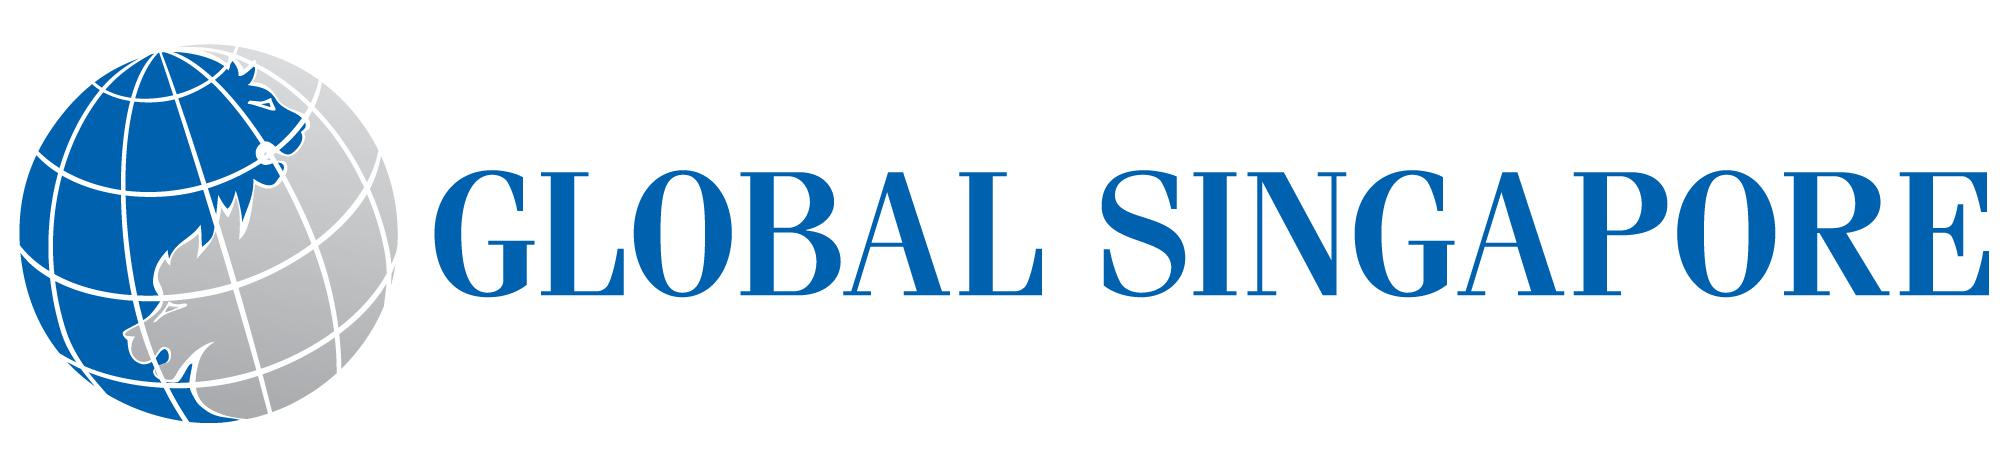 Global Singapore Associates Pte Ltd